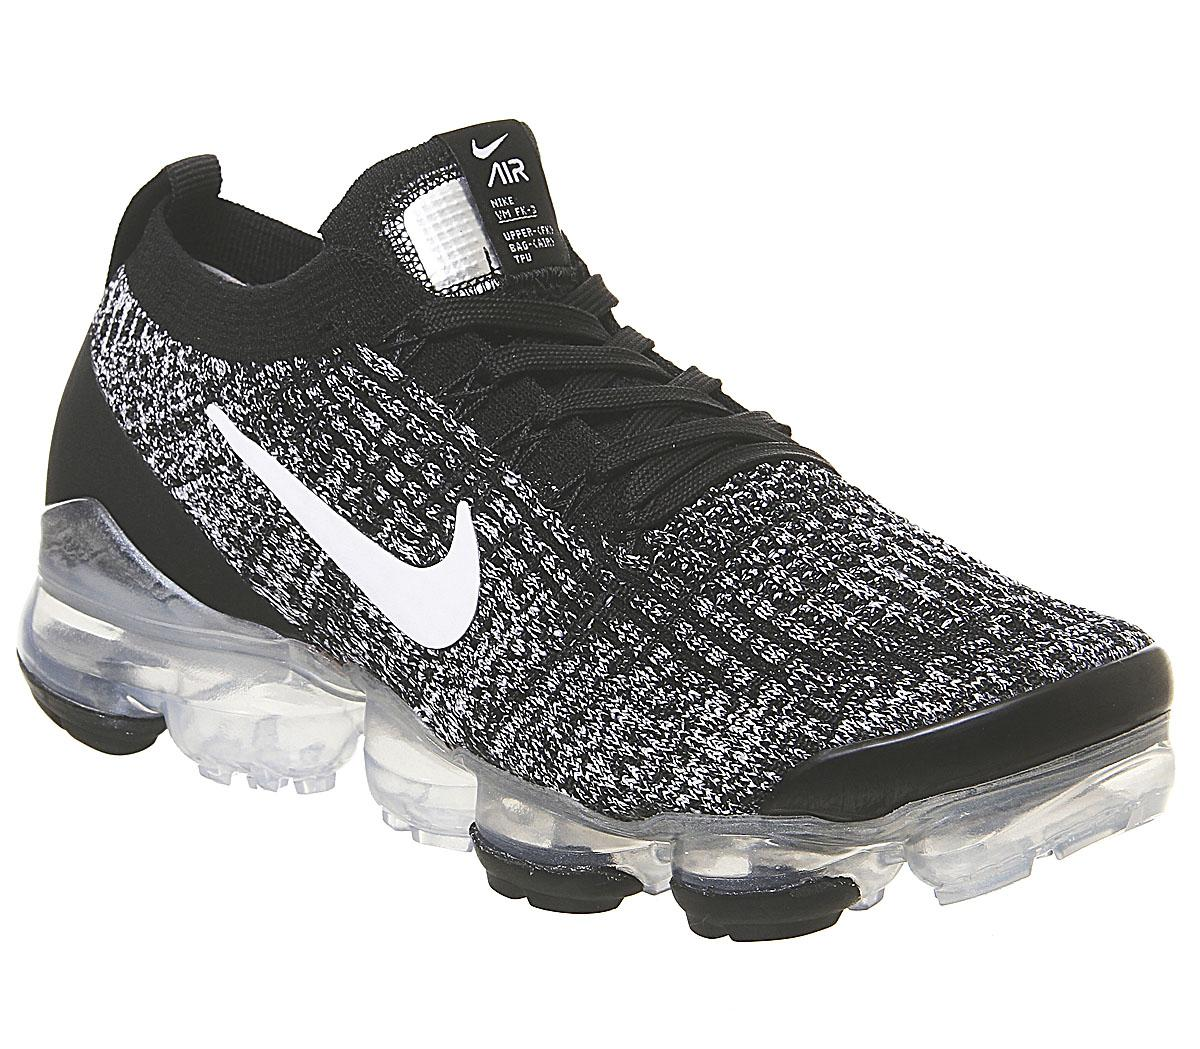 Nike Vapormax Air Vapormax Fk 3 Black